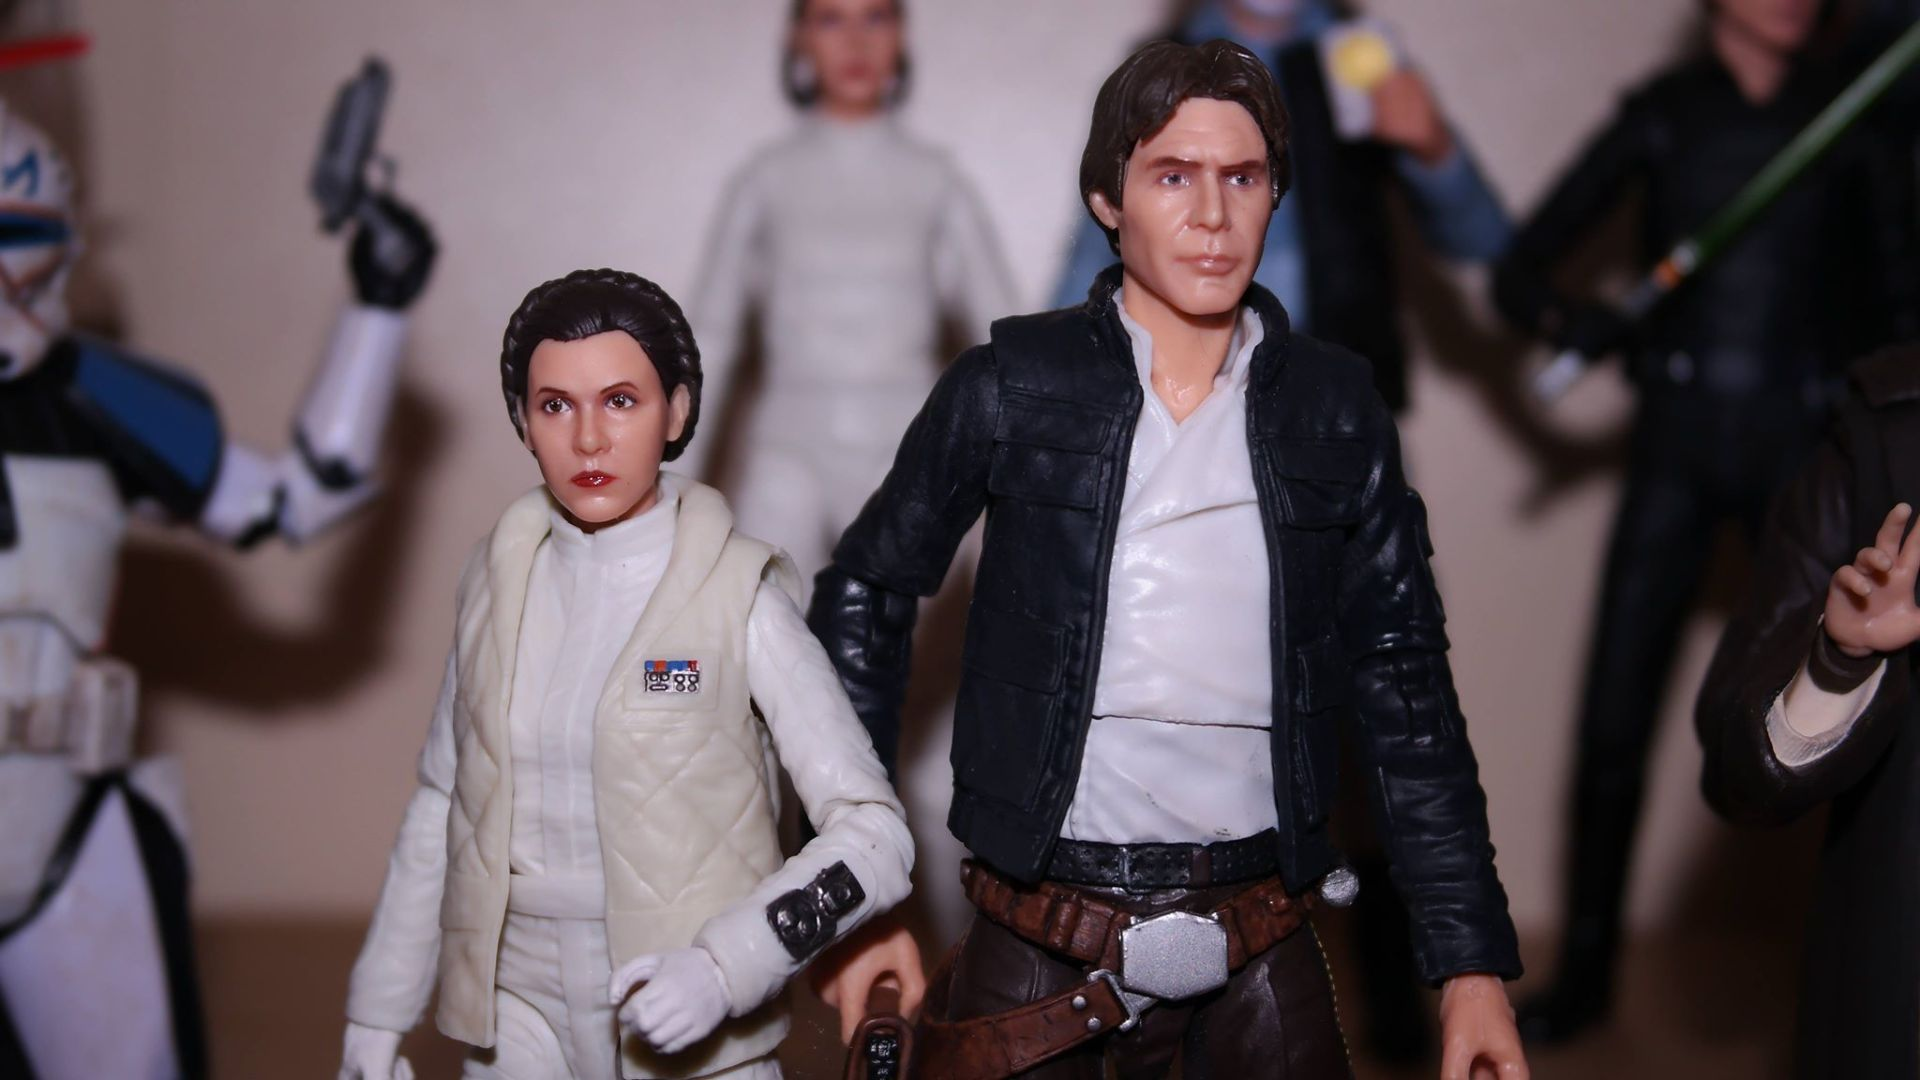 FOTF Star Wars Black Series Princess Leia (Hoth) Review 3